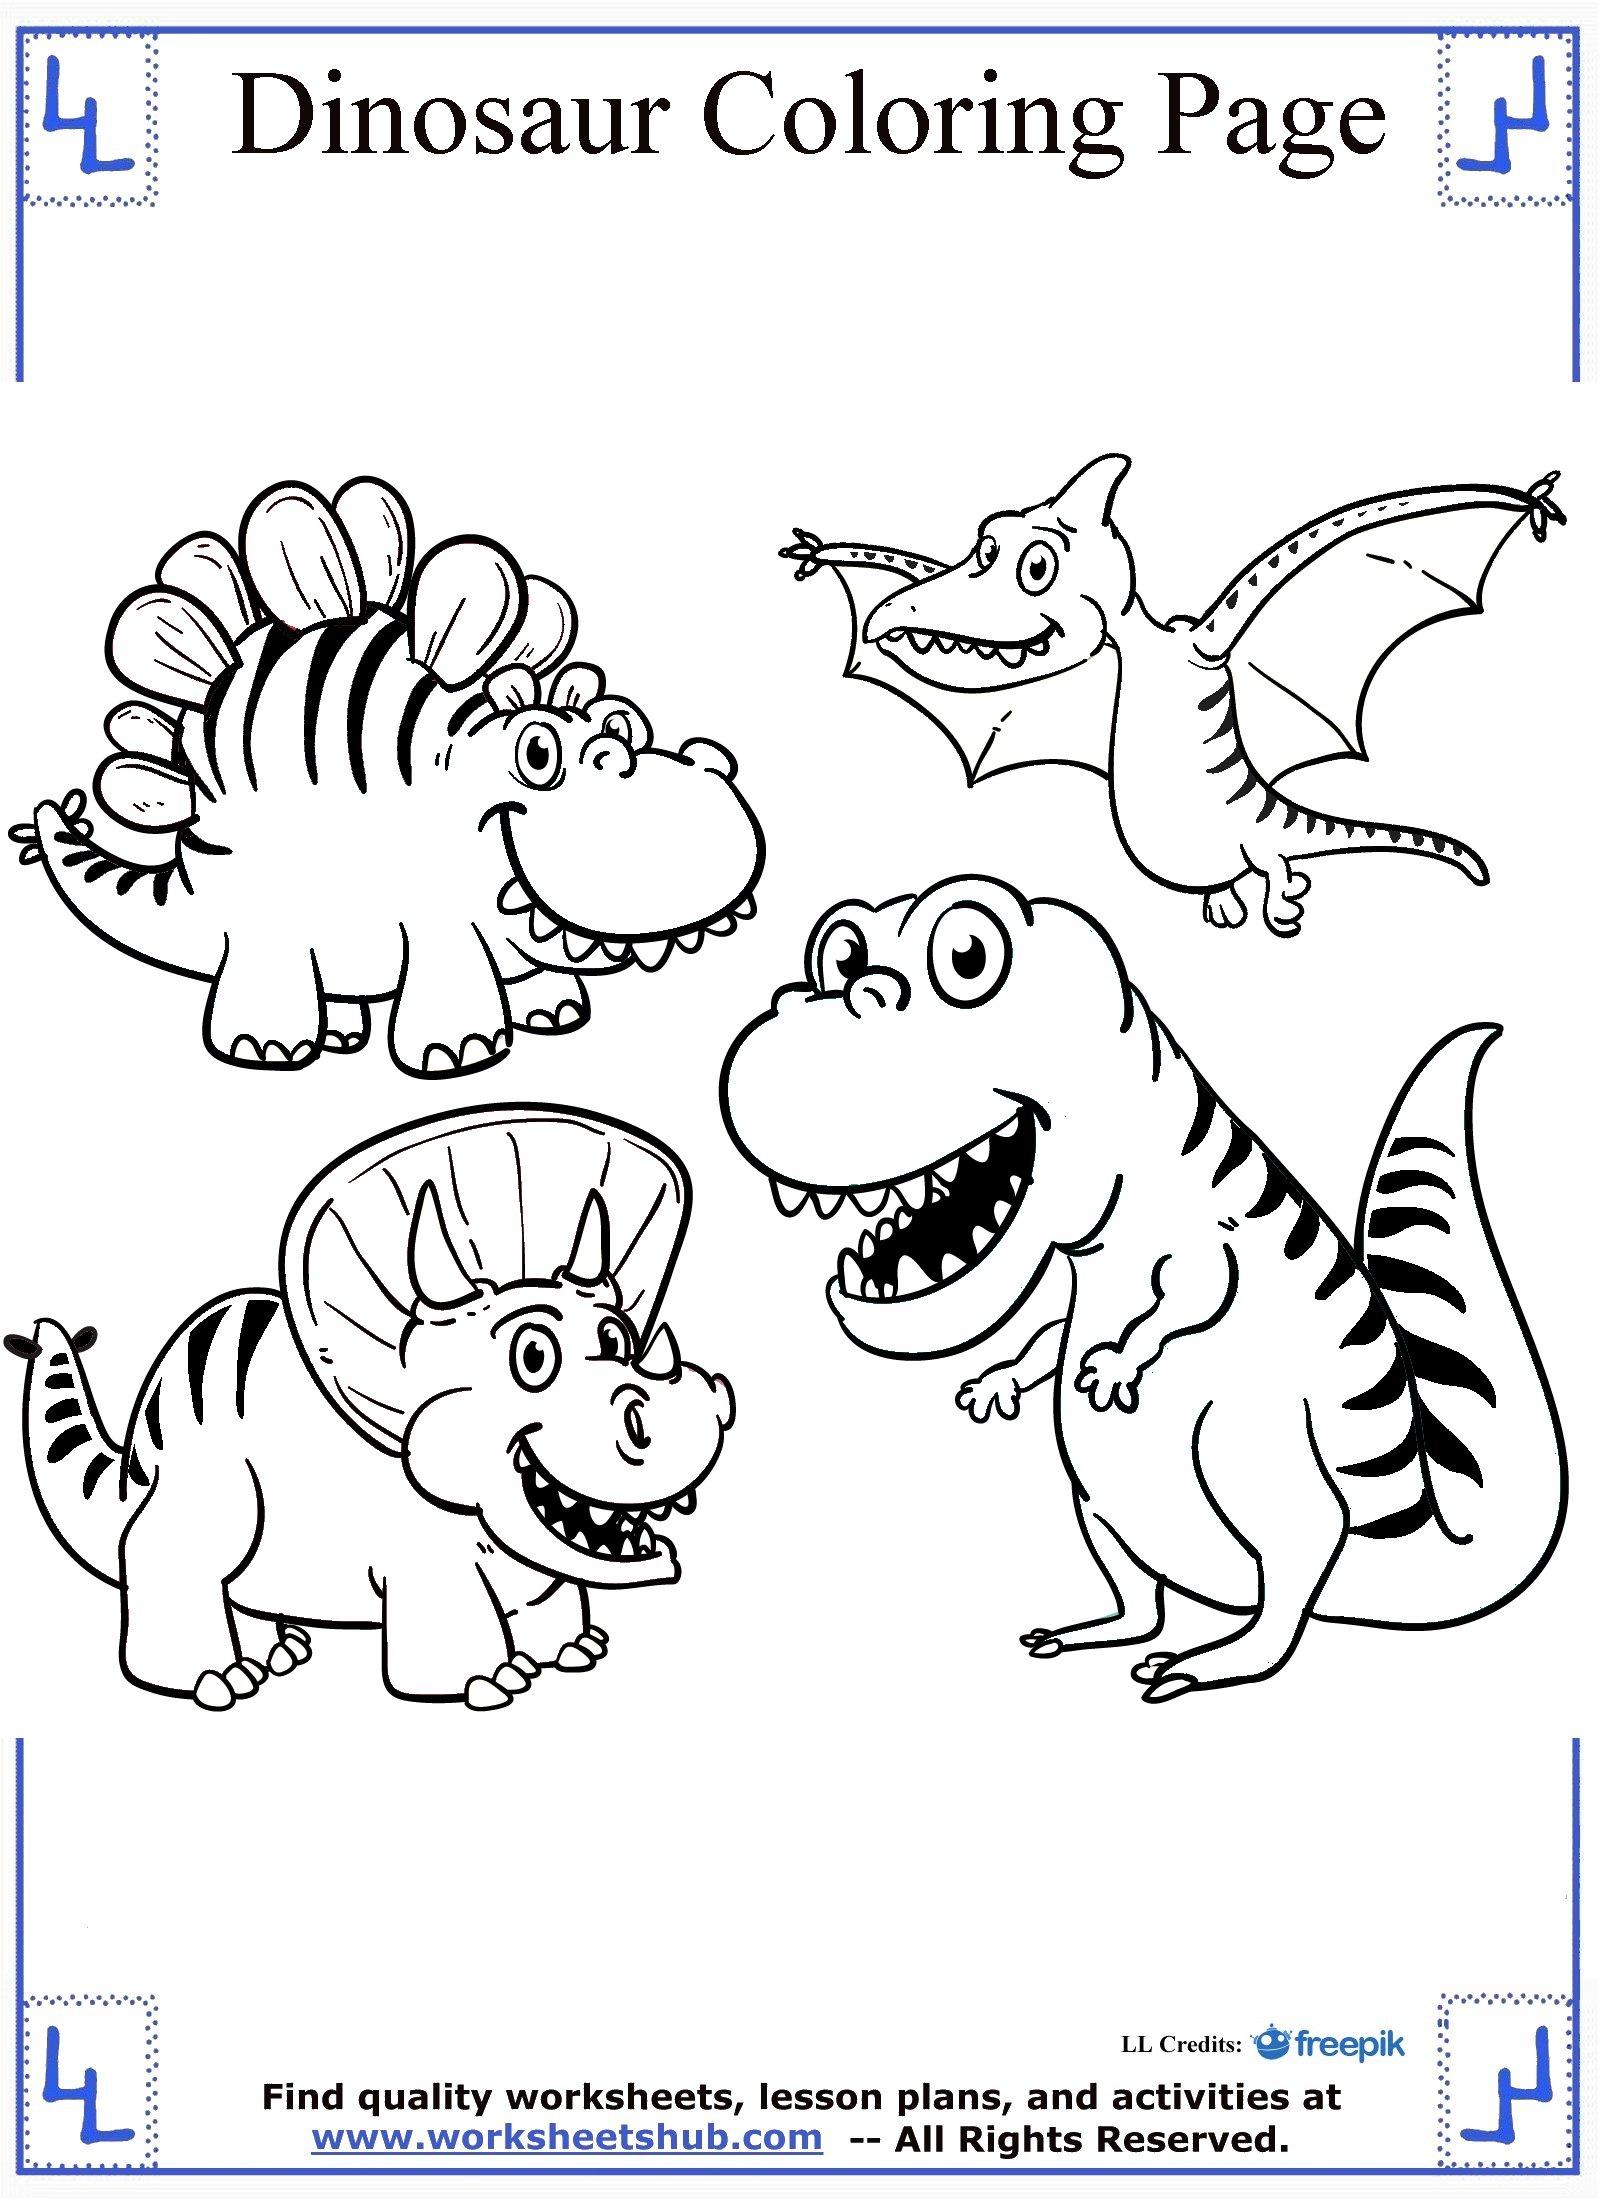 1600x2200 Dinosaurs Coloring Pages Dinosaur Ribsvigyapan Dinosaurs Cartoon